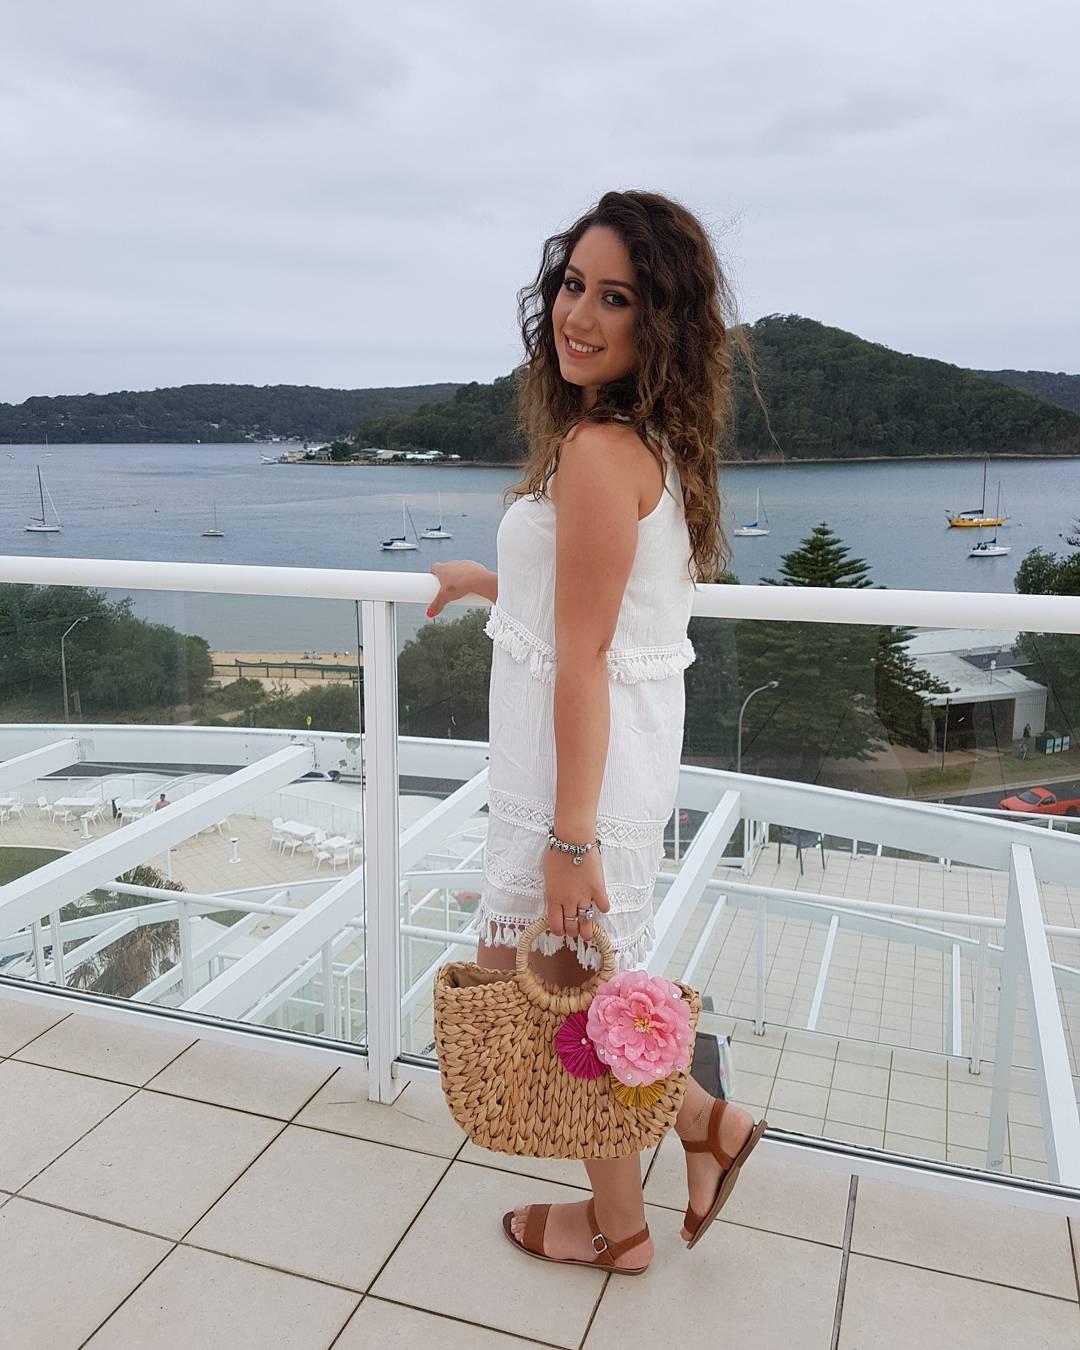 Vibrant Cotton White Summer Dress With Cute Jute Bag